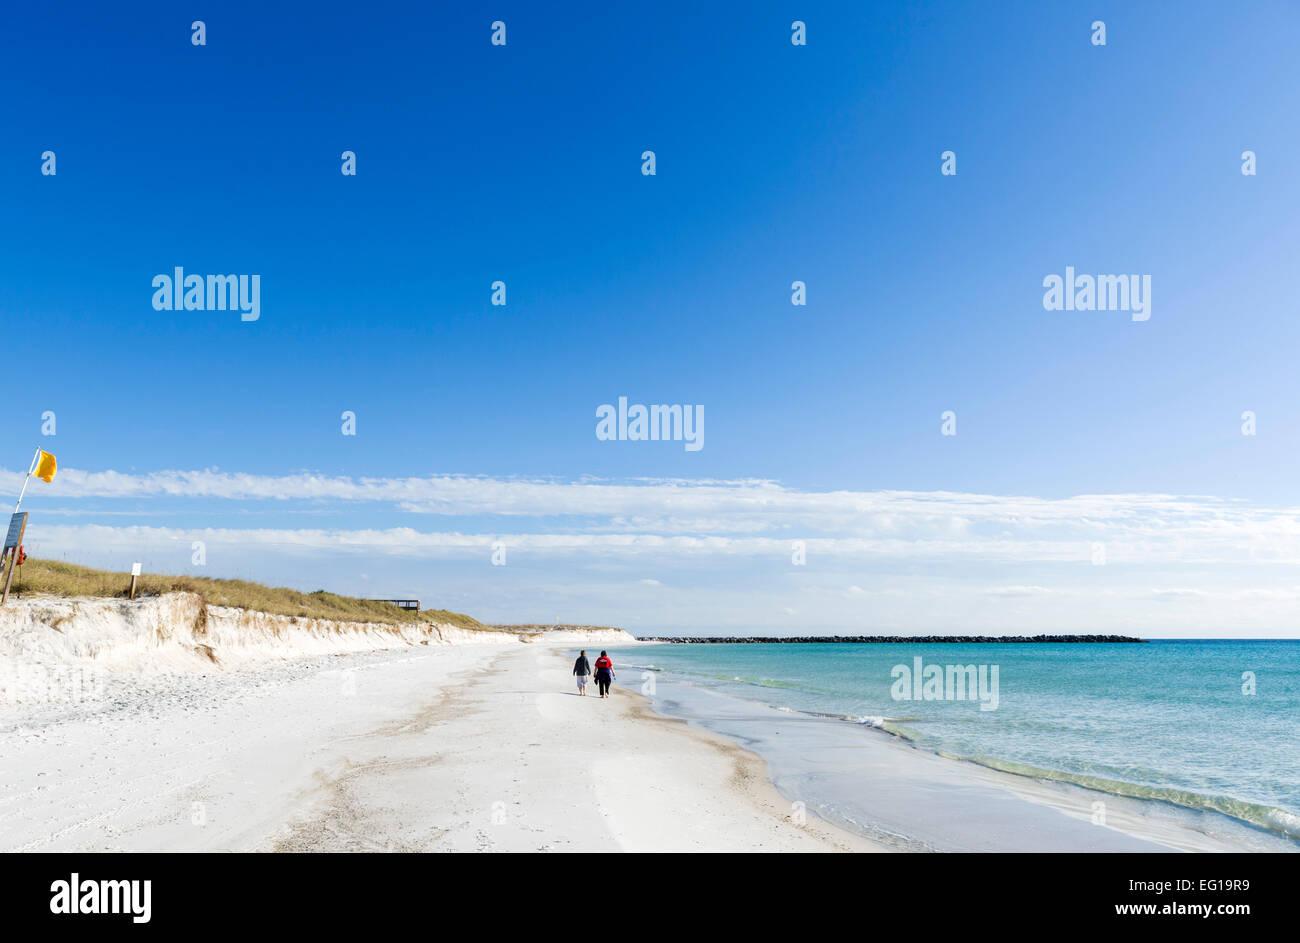 Der Strand von St Andrews Staatspark, Panama City Beach, Florida, USA Stockbild